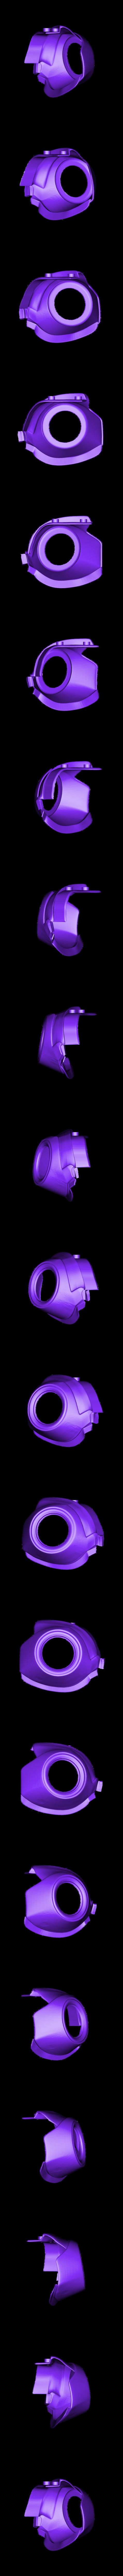 Lucio_speakerMnt_lft.stl Download free STL file Overwatch Lucio Blaster • 3D printer object, Adafruit